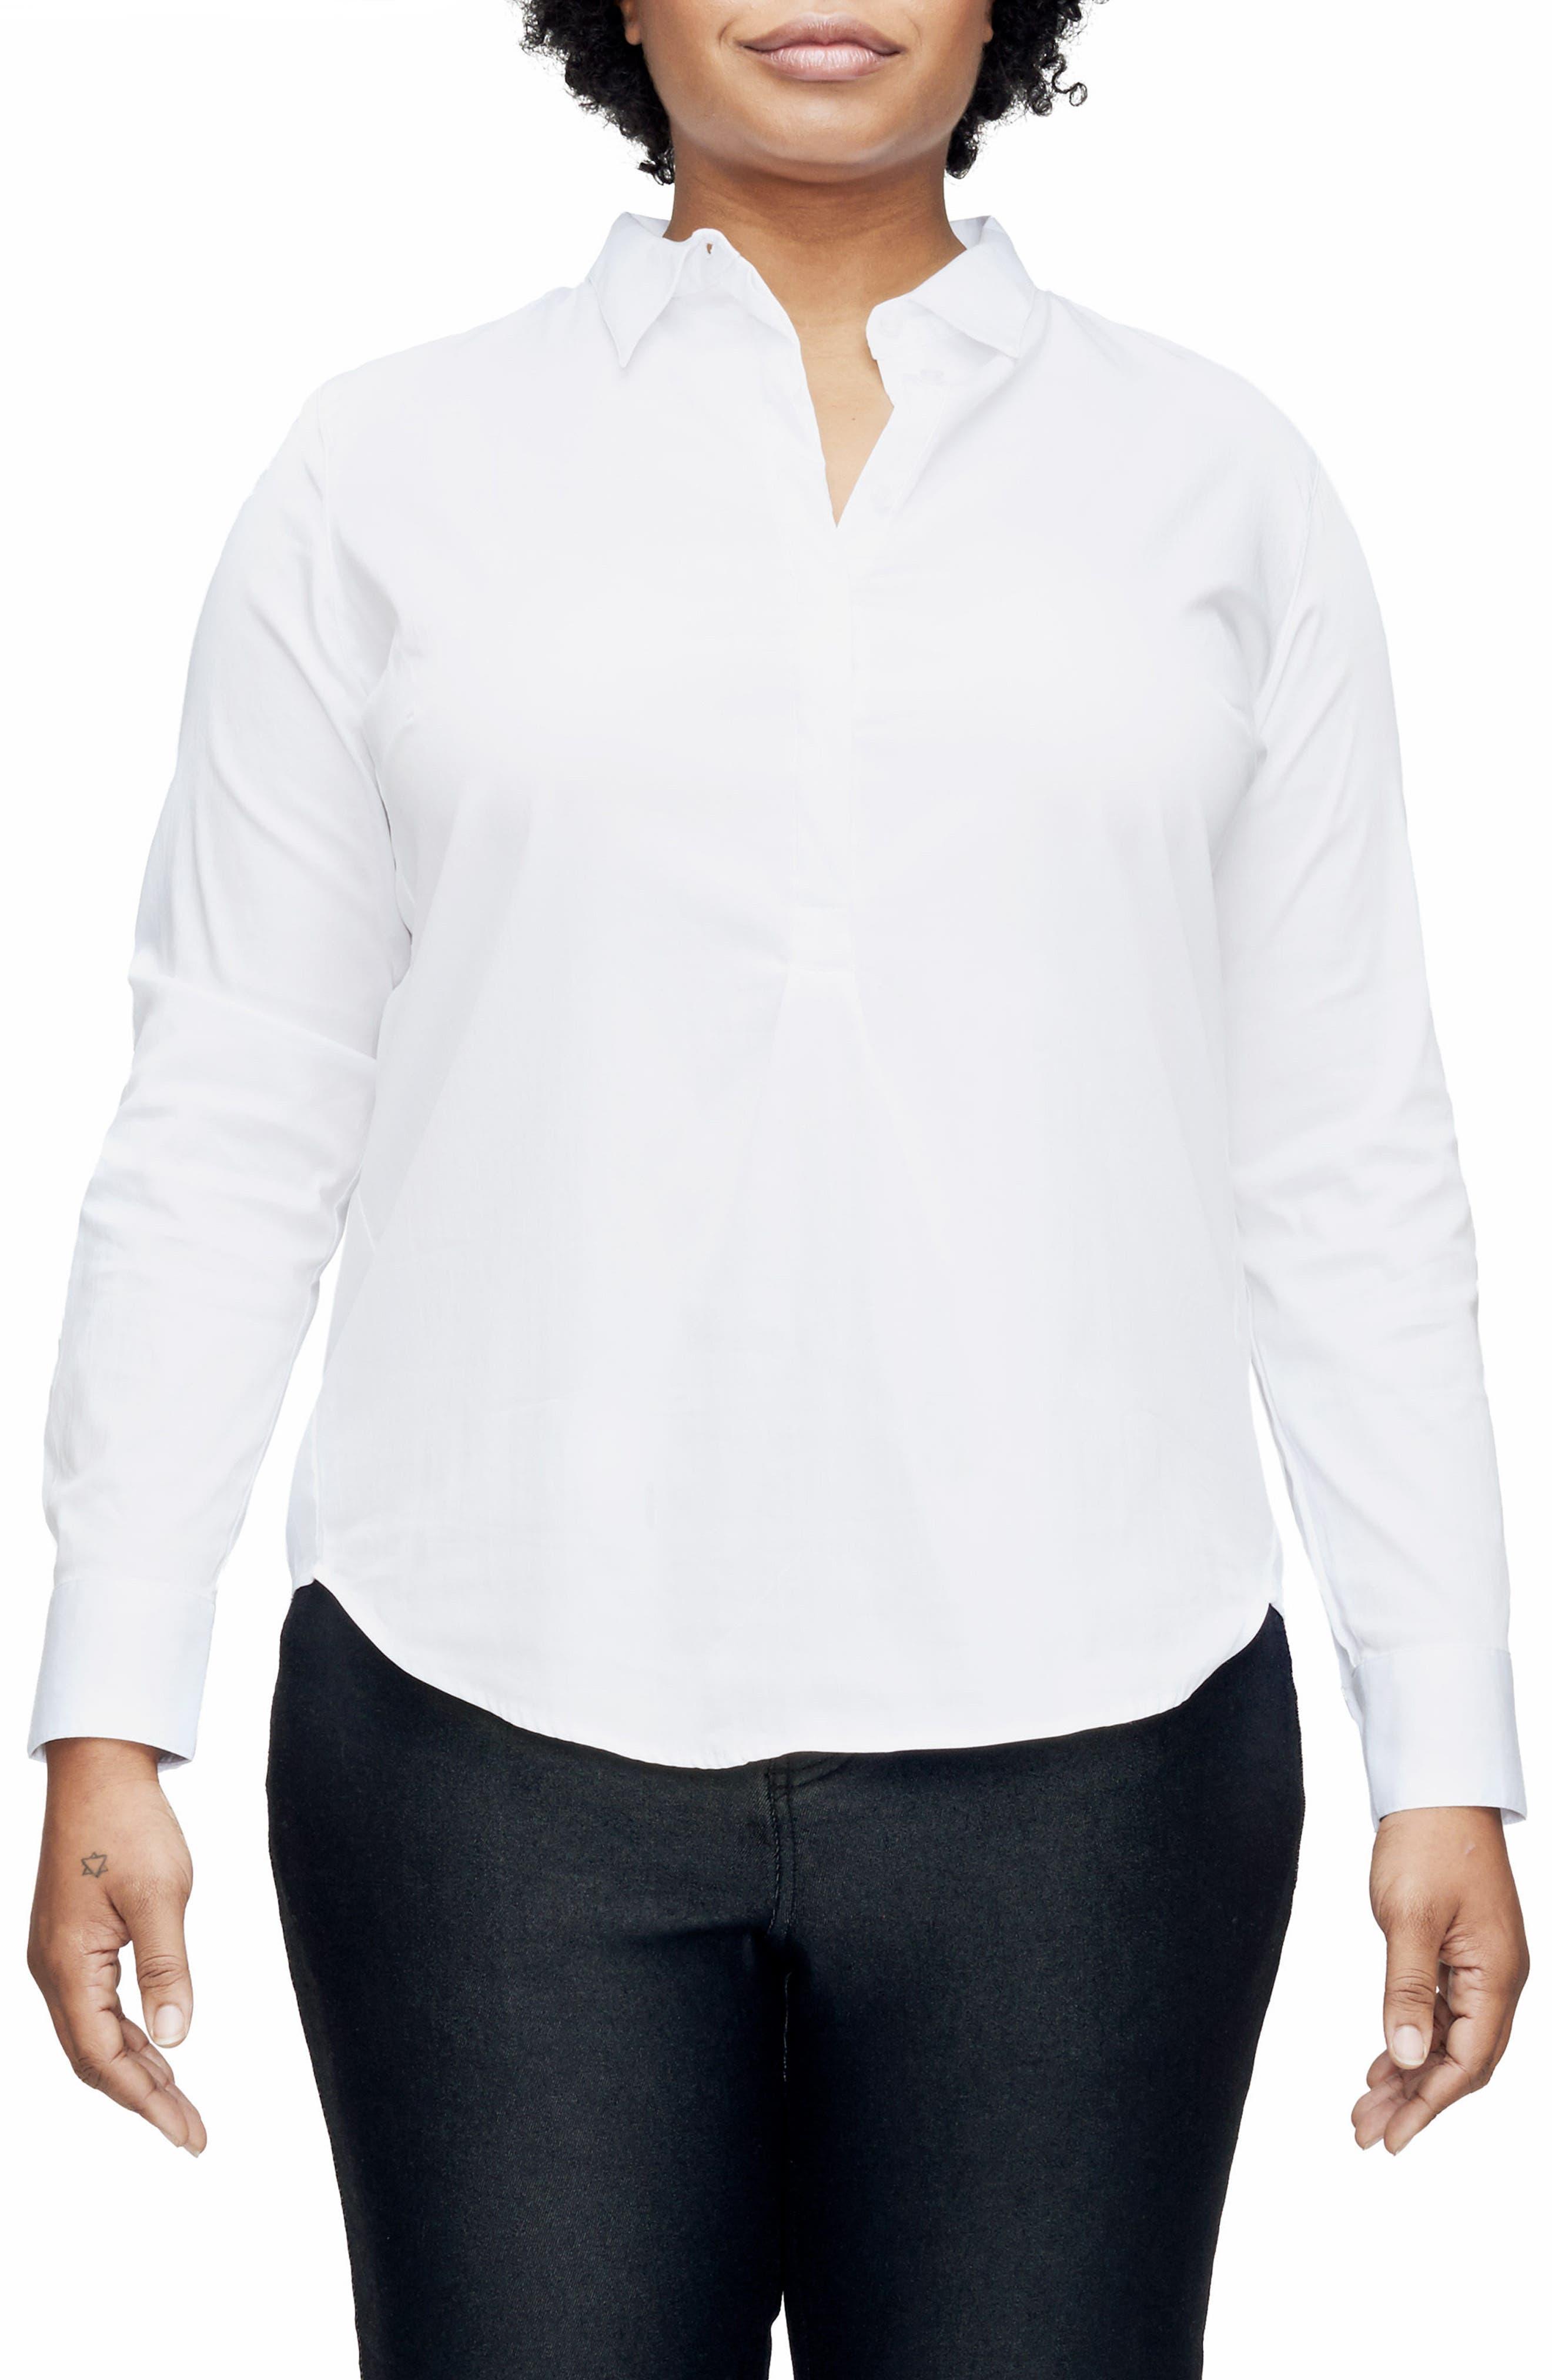 Elbe Shirt,                             Main thumbnail 1, color,                             White